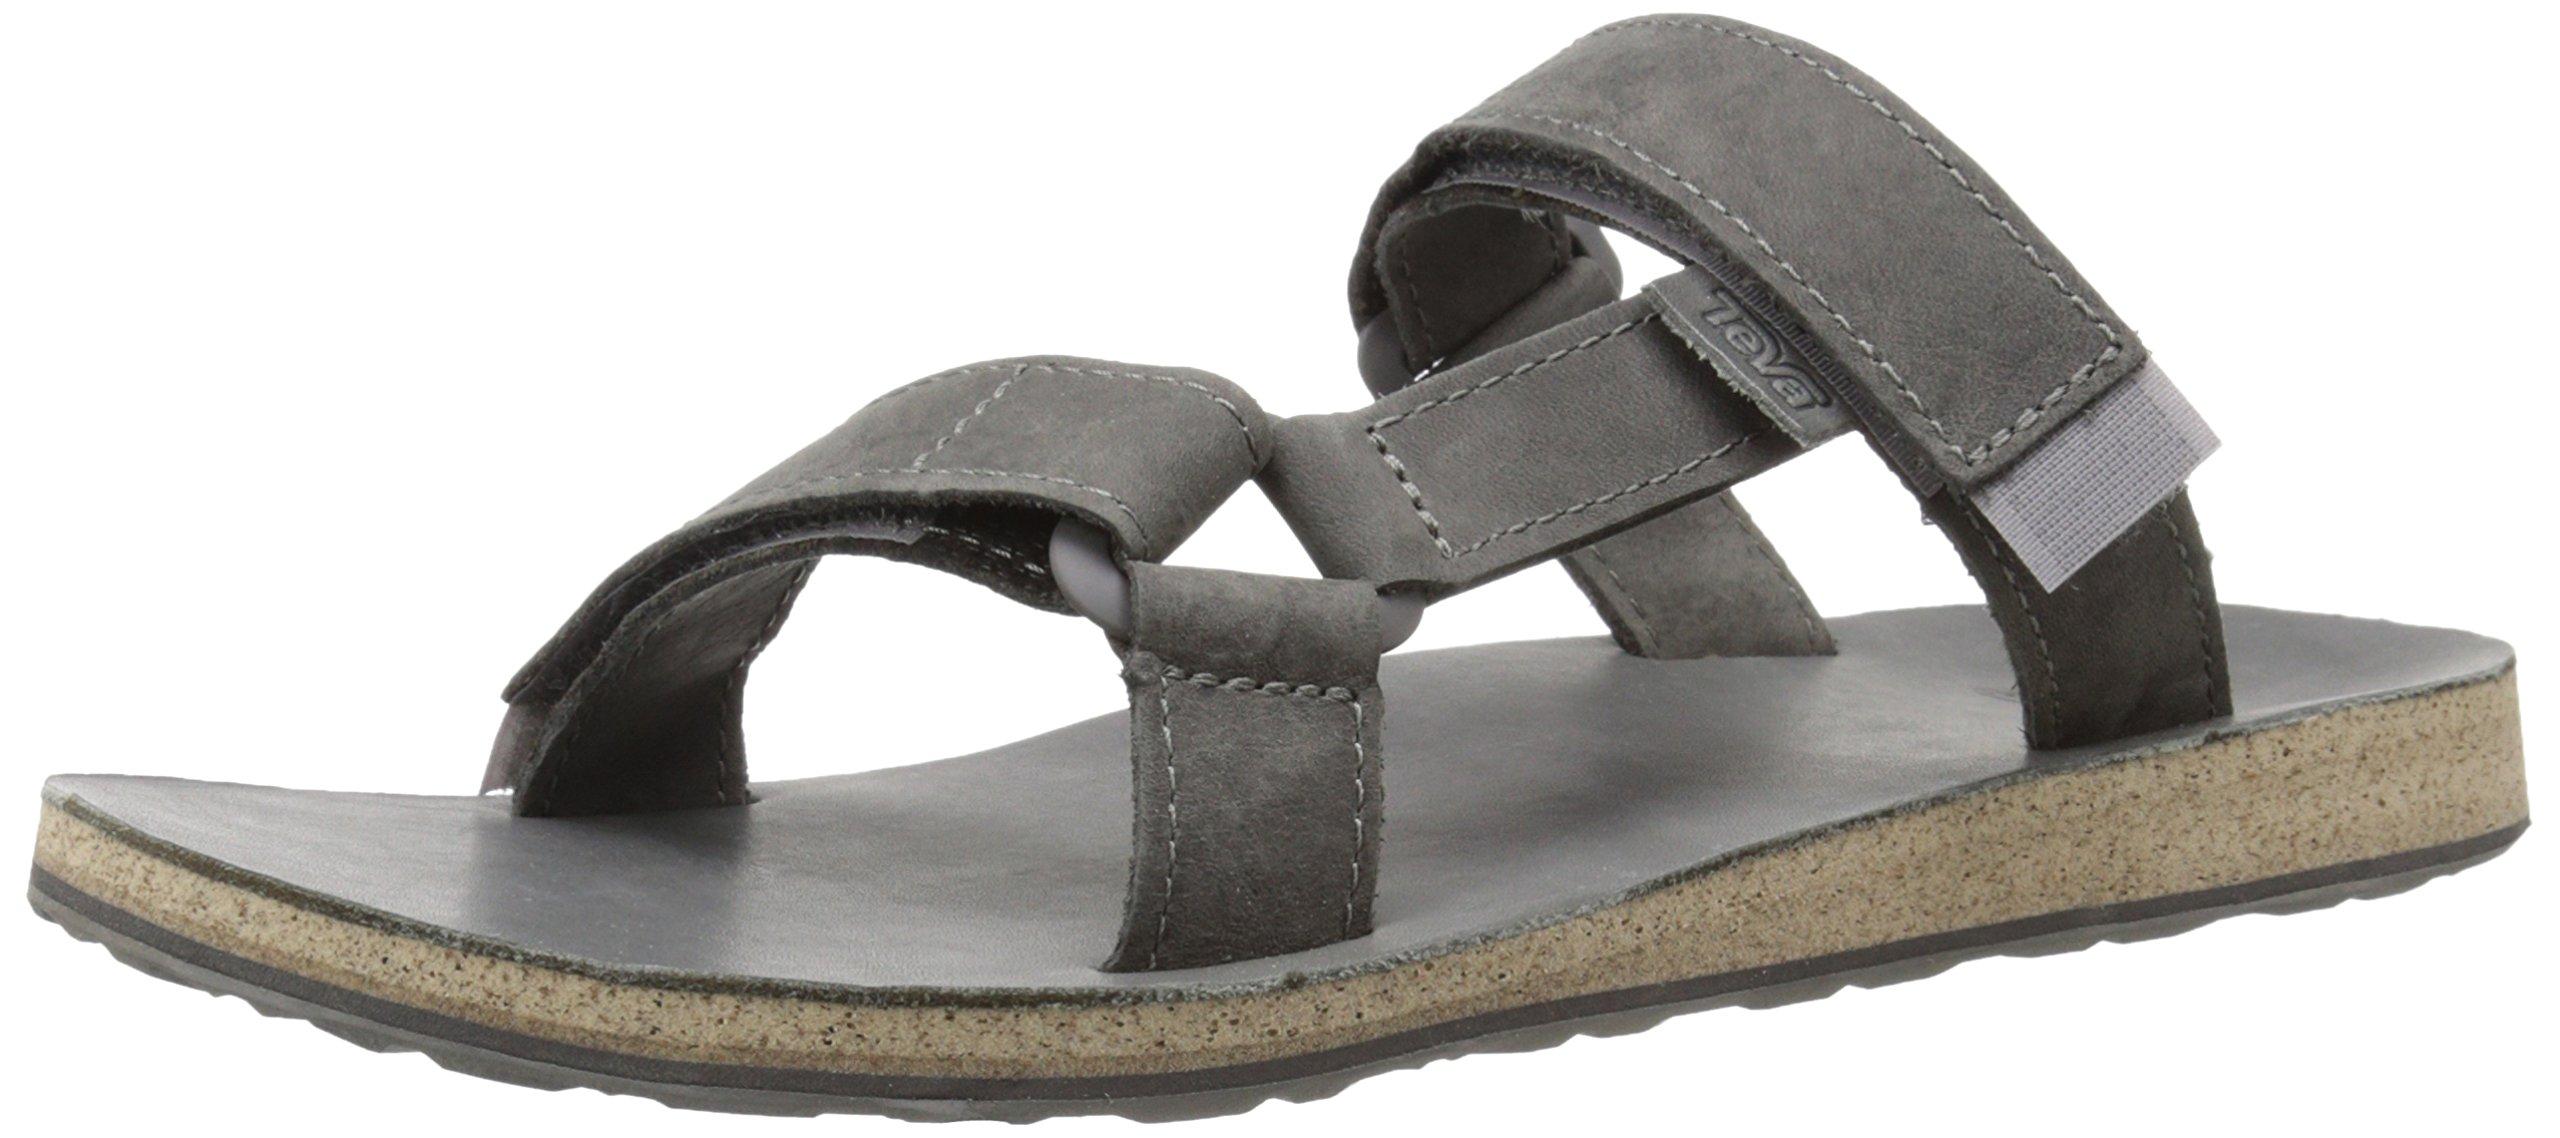 7f89f95fd84e51 Galleon - Teva Men s Universal Slide Leather Sandal